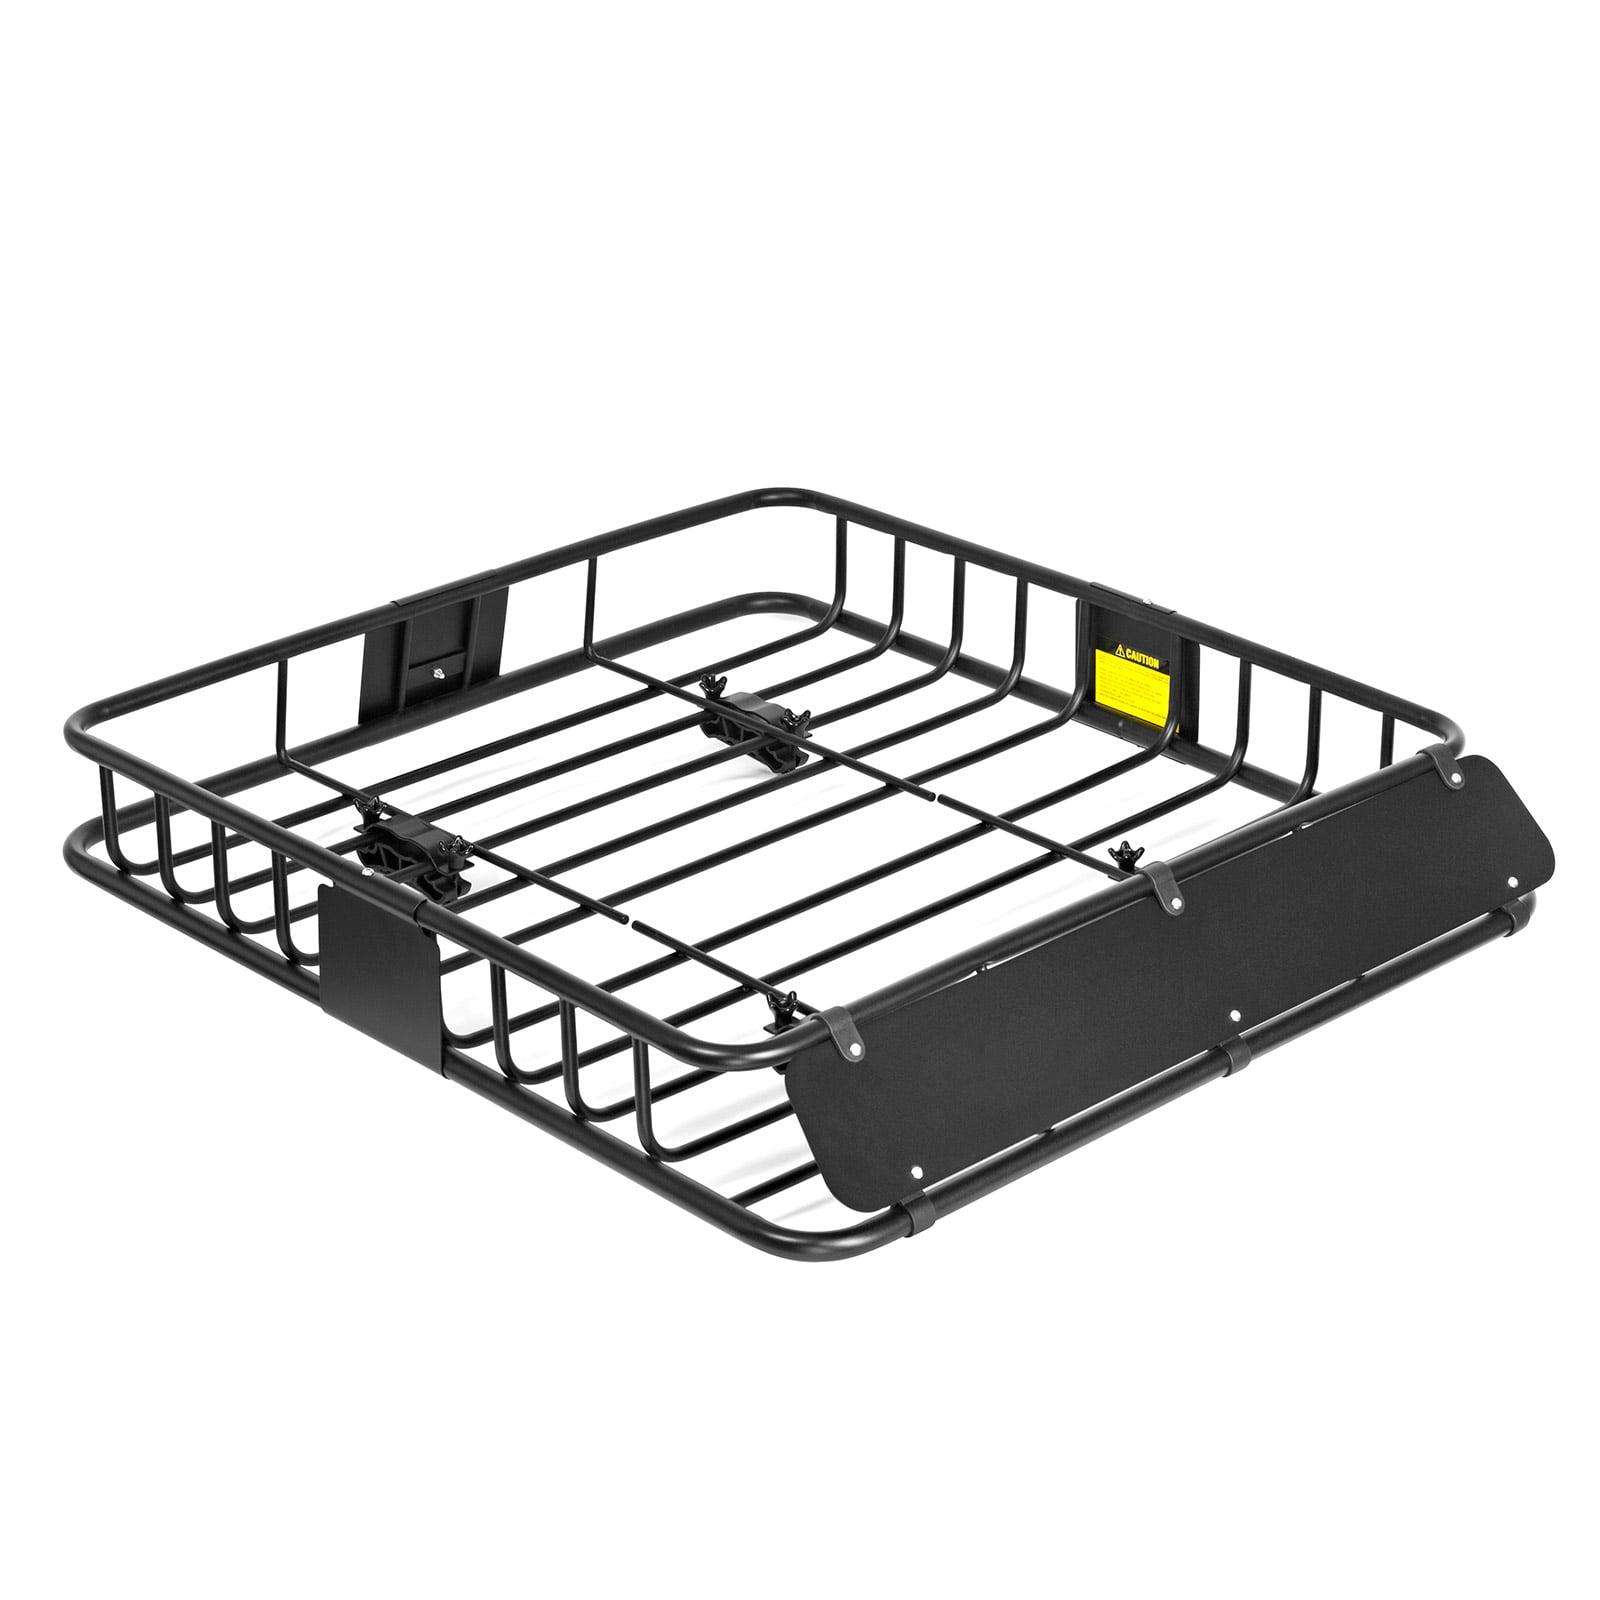 Direct Aftermarket  Black Universal Roof Rack Cargo Car S...